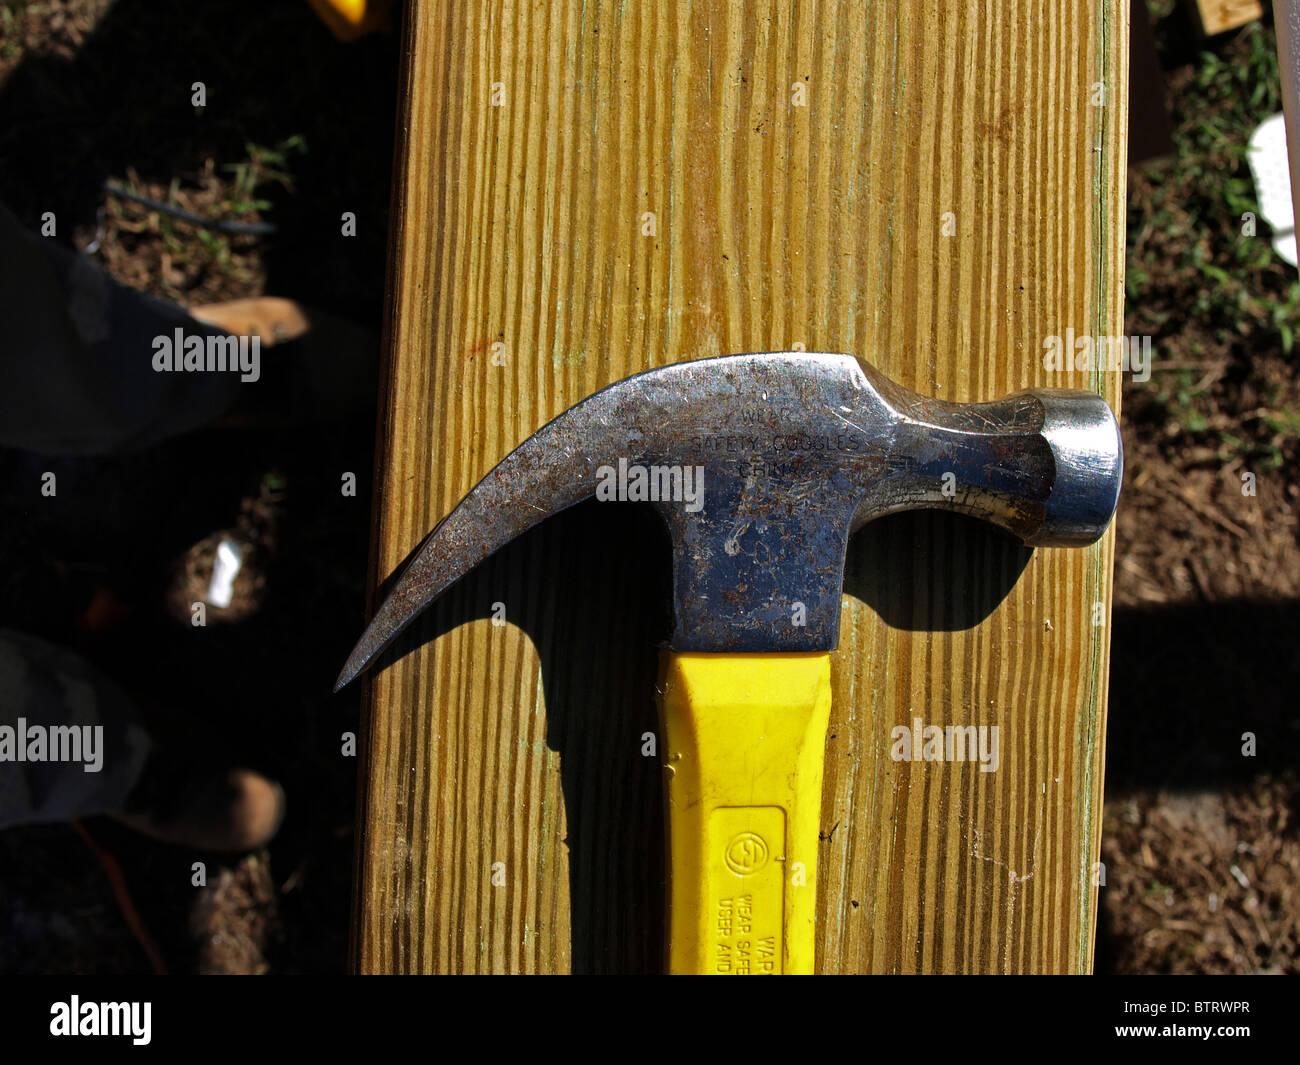 claw hammer construction building yellow head metal handle on wood closeup shadow stud - Stock Image